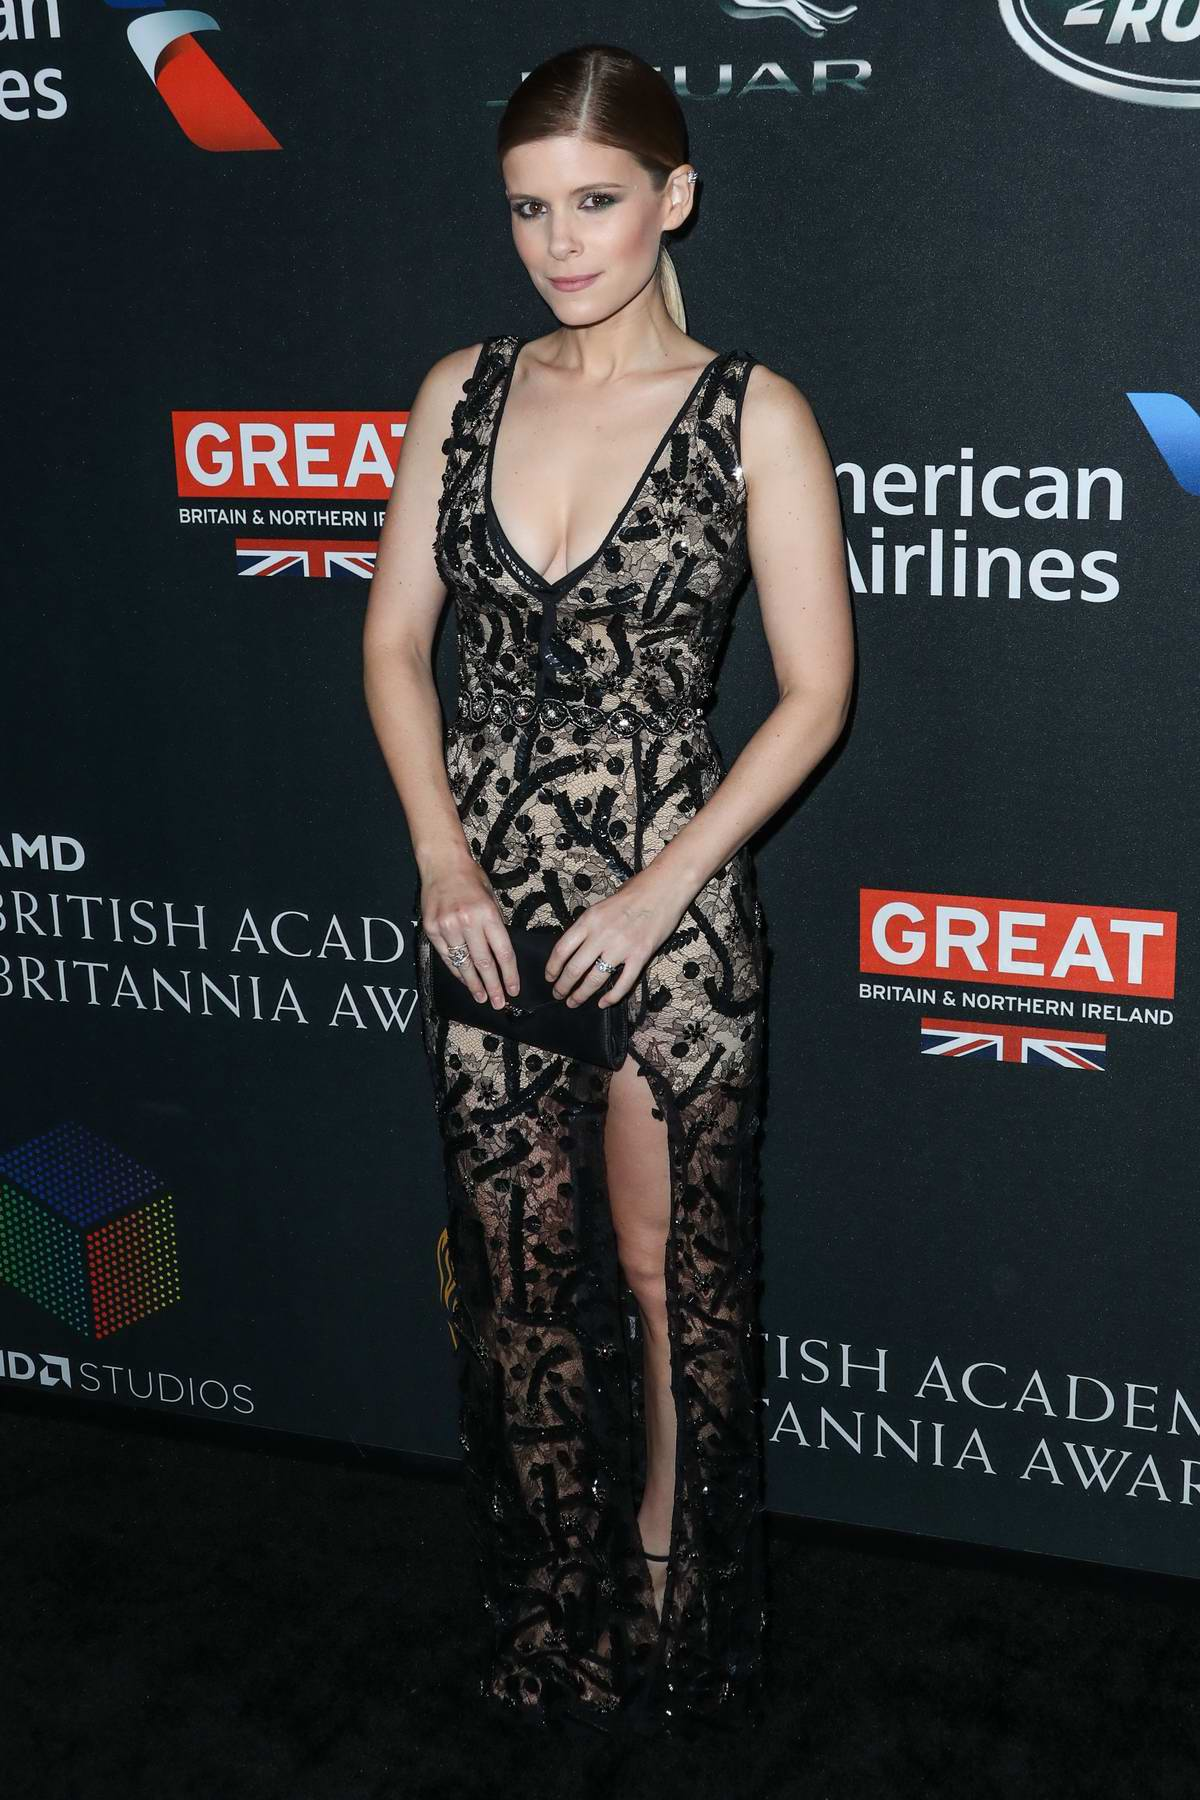 Kate Mara at the British Academy (BAFTA) Britannia Awards 2017 in Los Angeles